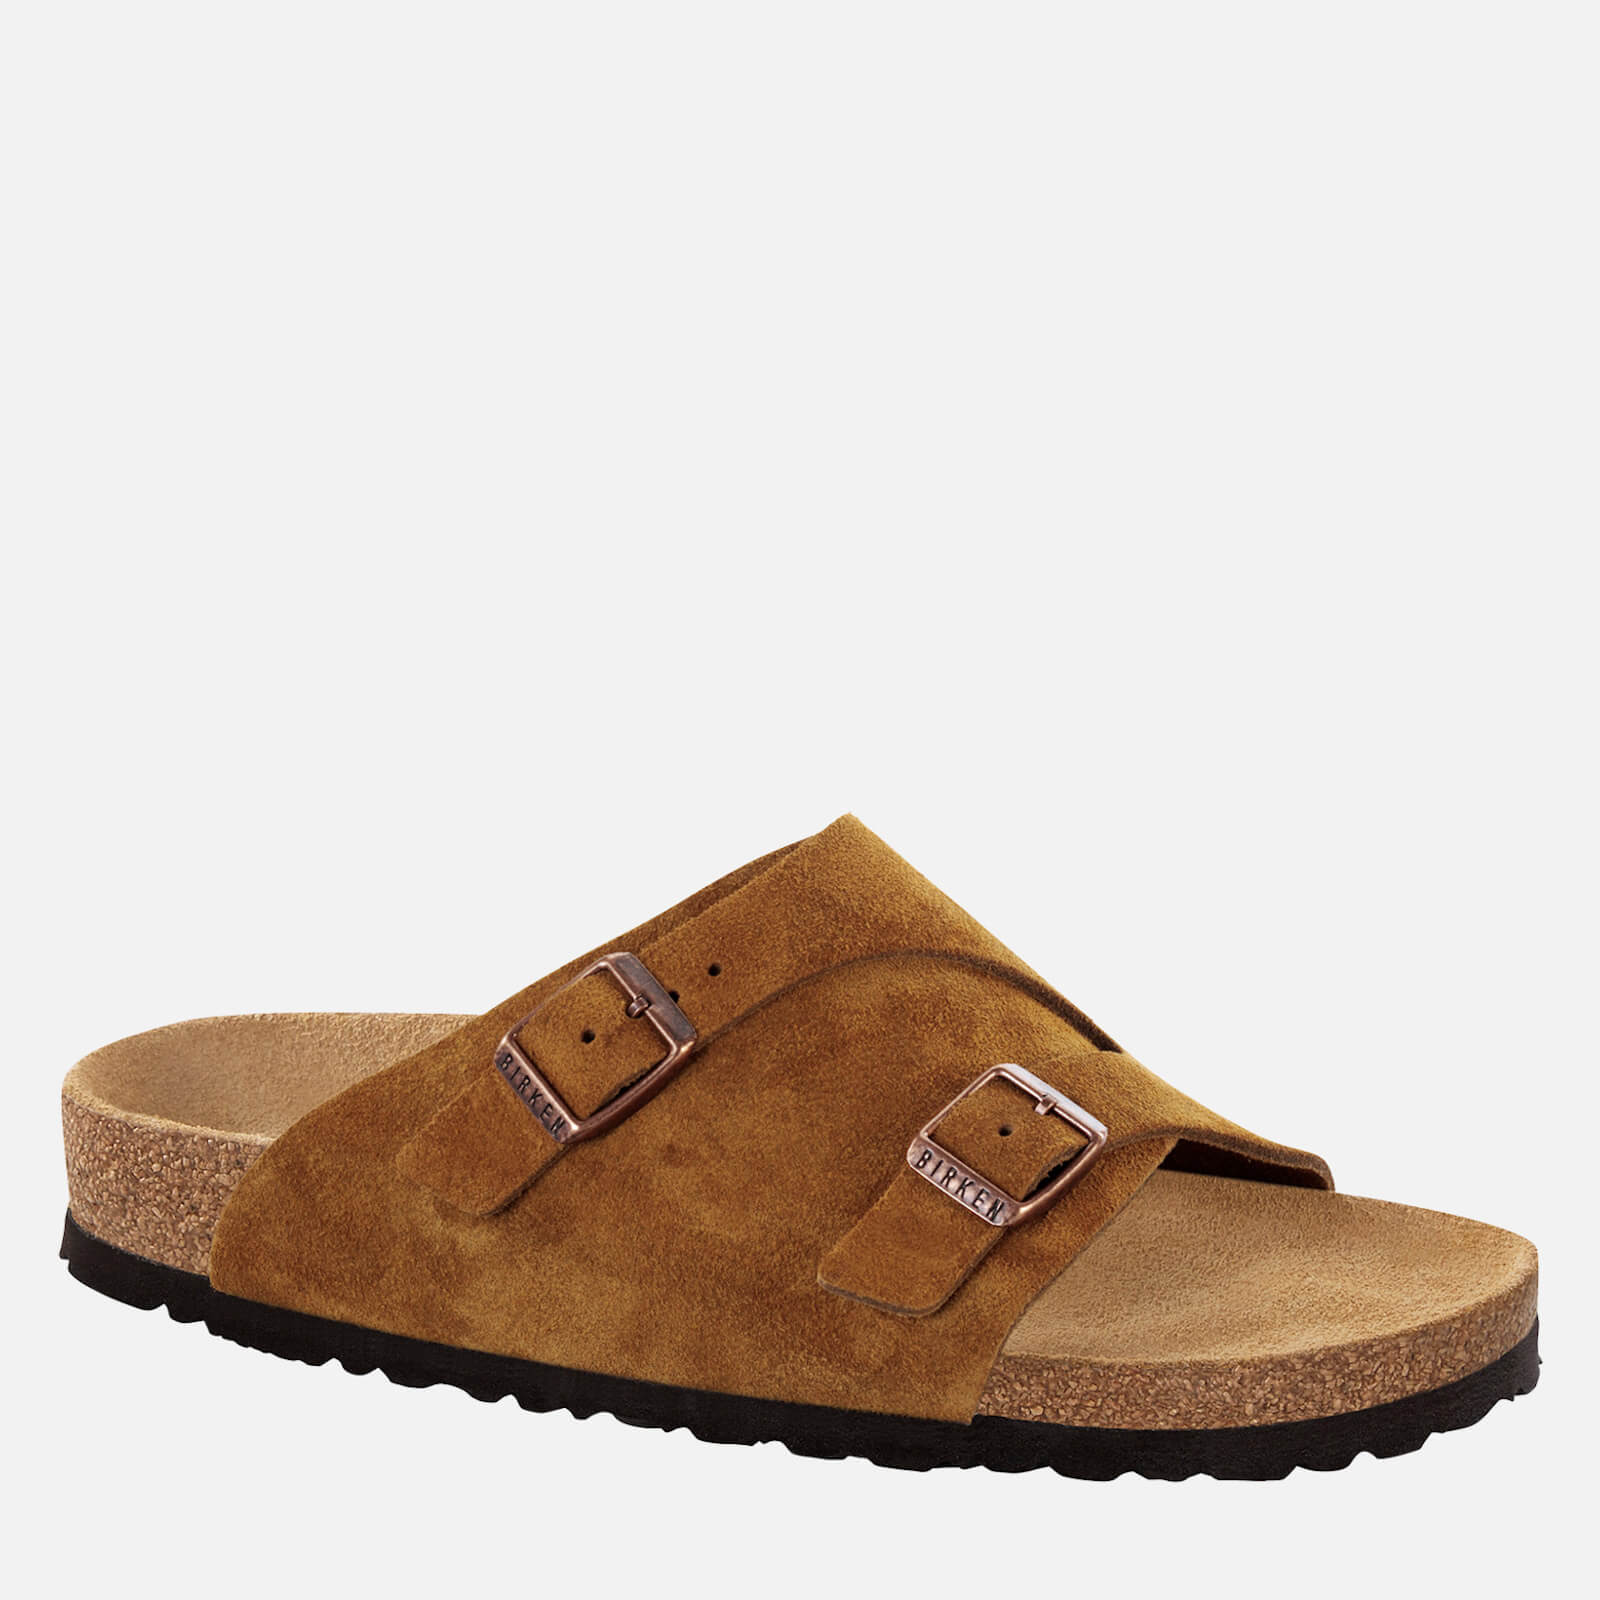 Birkenstock Mens Zurich Sfb Suede Slide Sandals Mink Eu 44 Uk 95